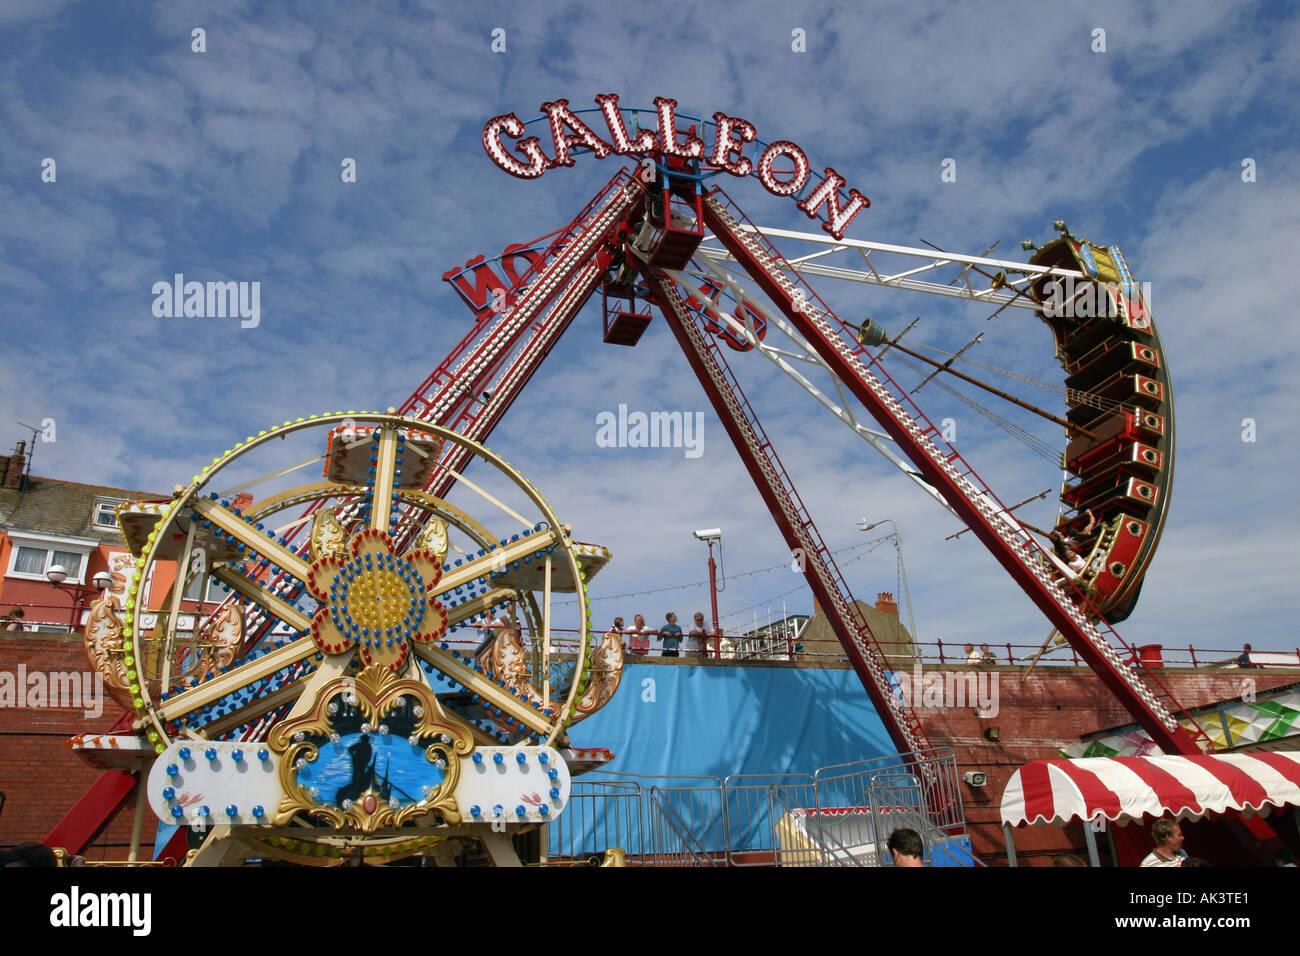 Vintage carnival ride www imgarcade com online image arcade - Filename Fun Fair Rides At The Sea Side Bridlington Uk Ak3te1 Jpg